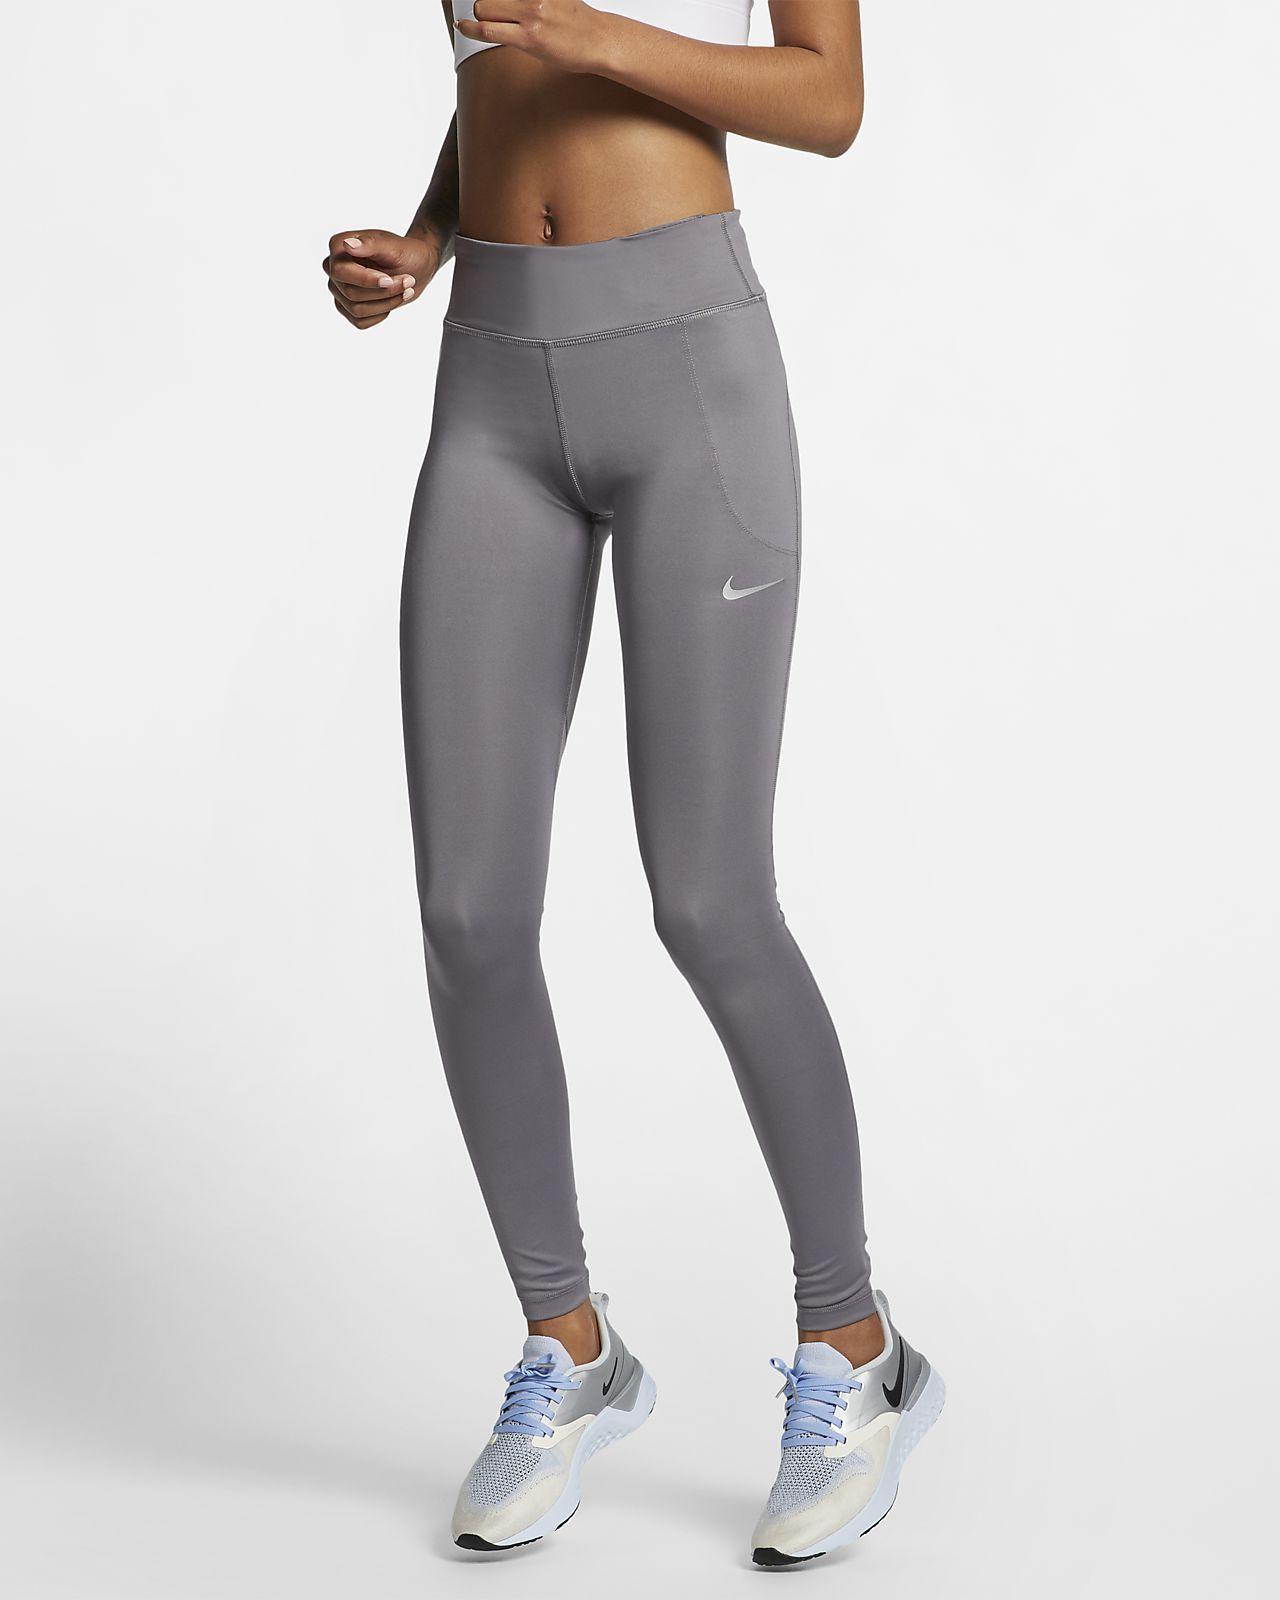 Lejos reputación Musgo  Nike Fast Women's Running Tights. Nike.com   Running tights women, Running  women, Running tights